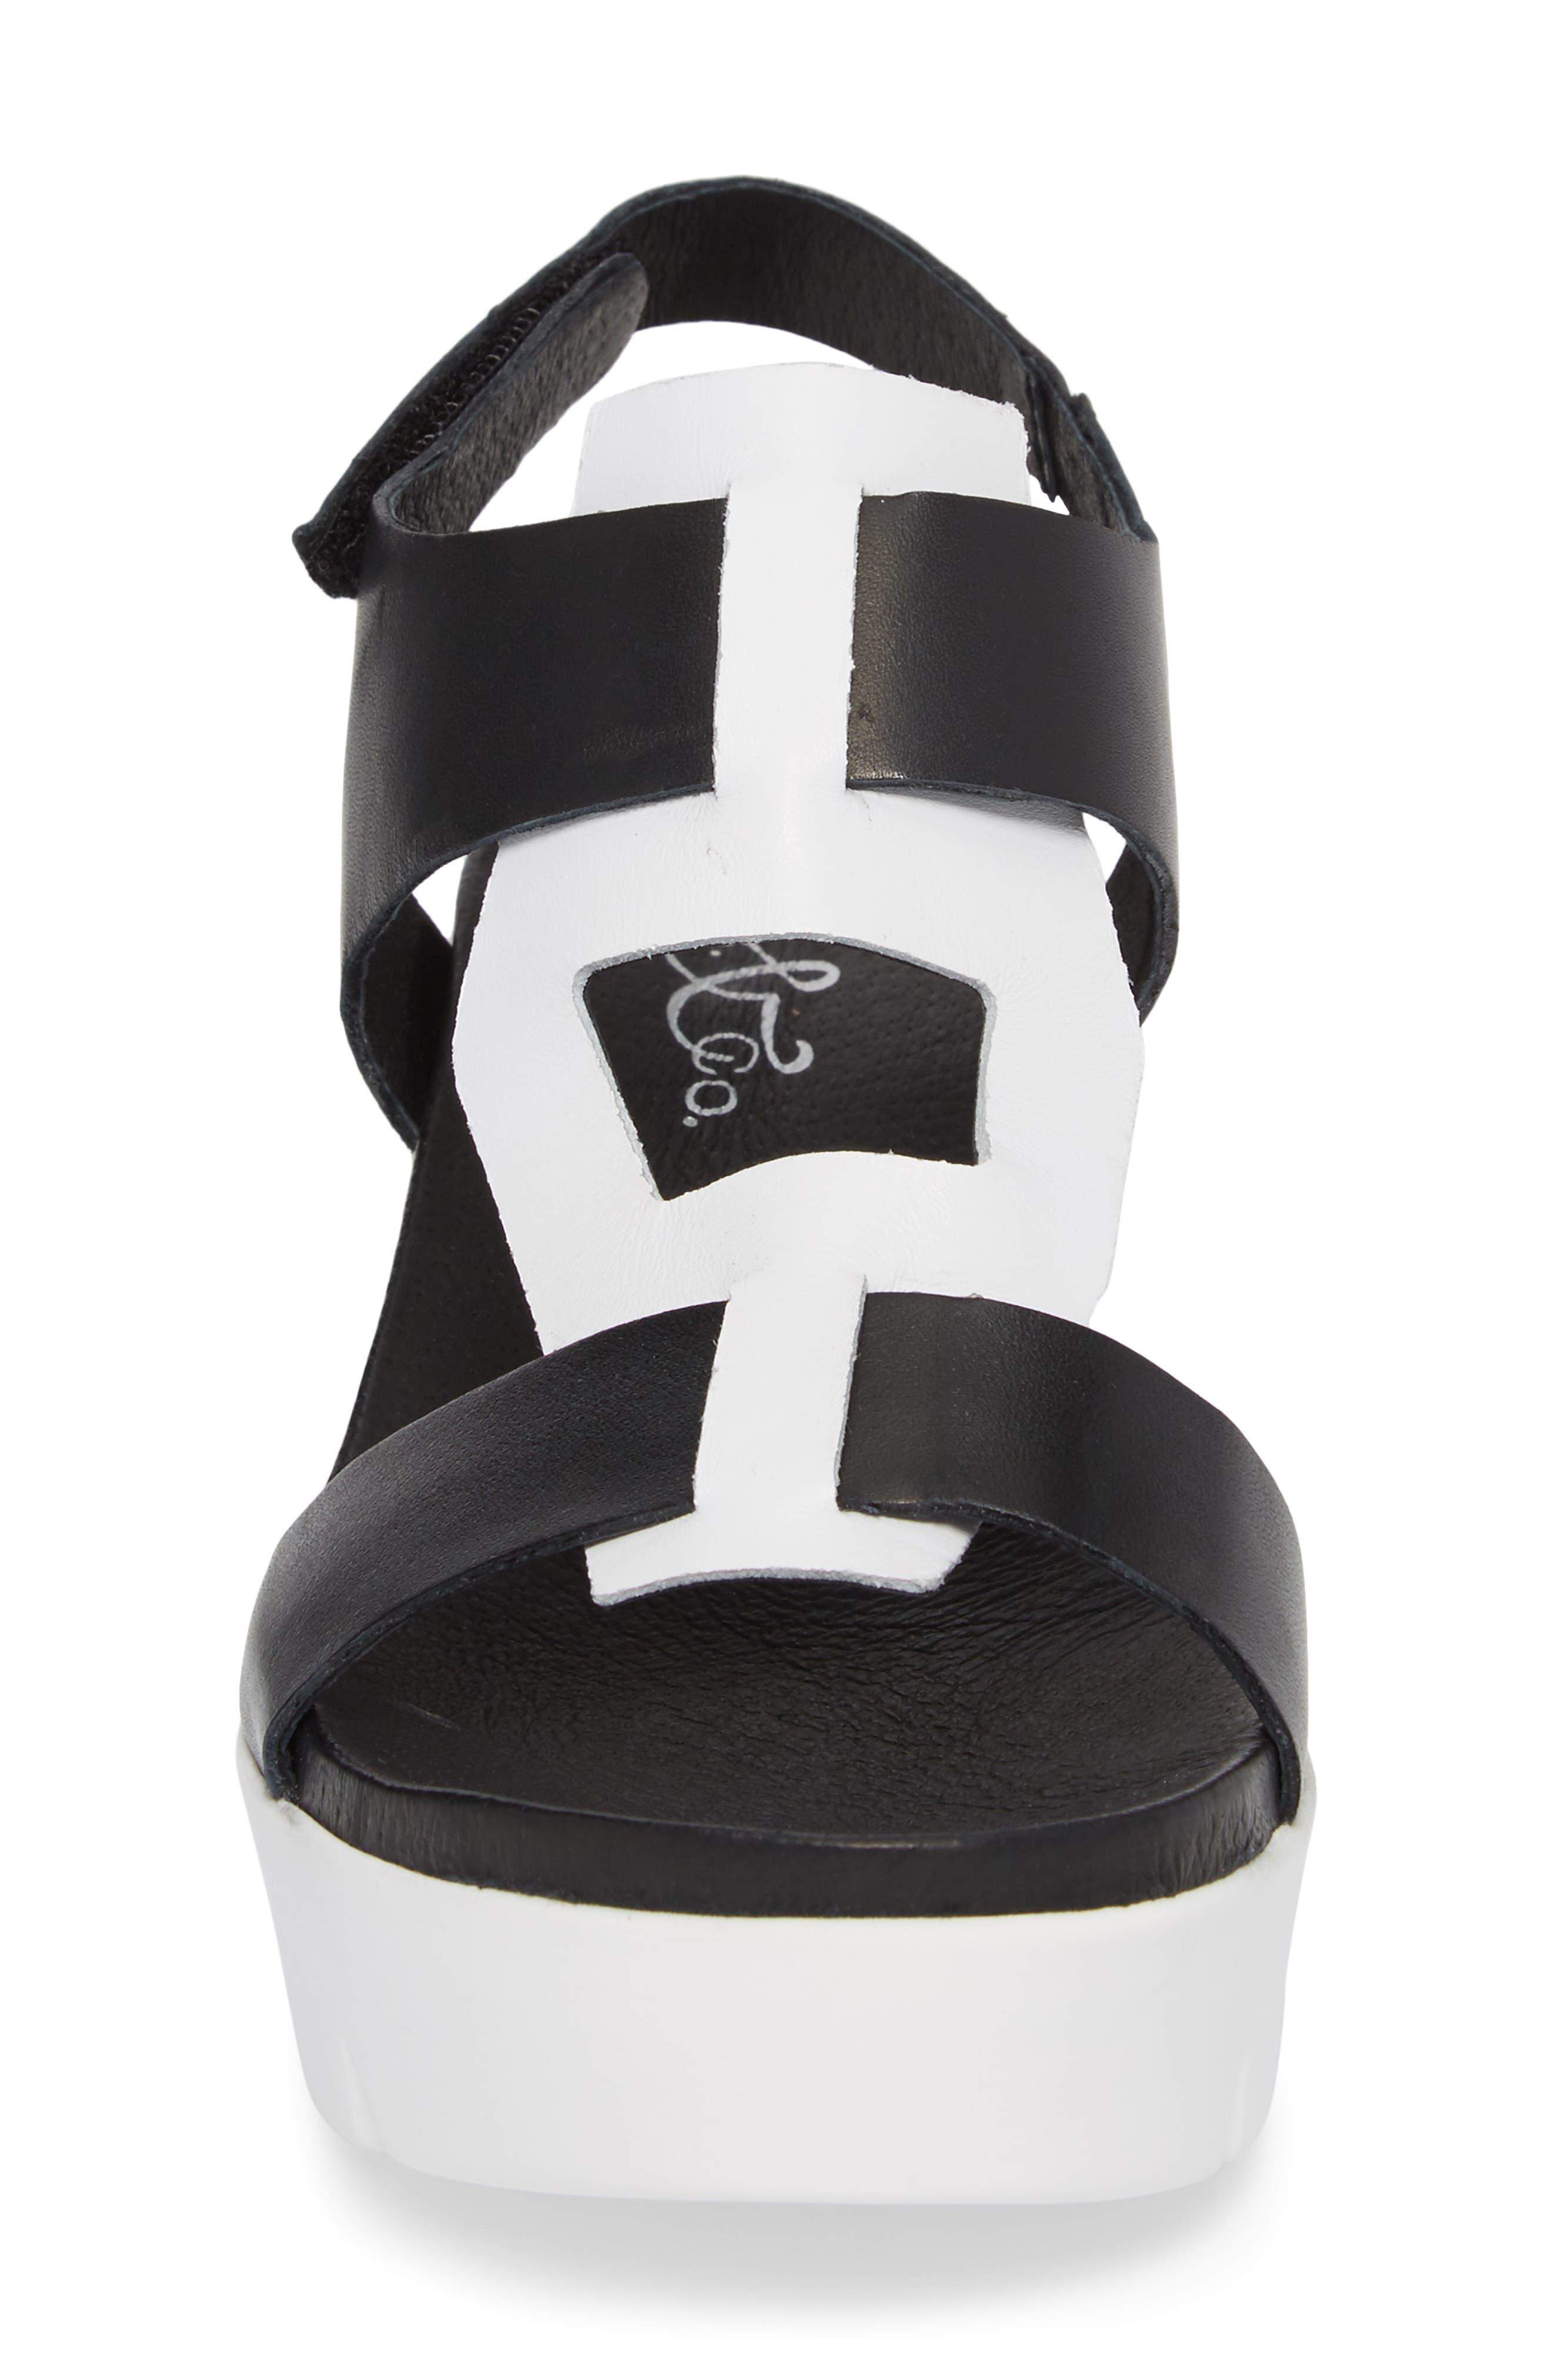 Somo Platform Wedge Sandal,                             Alternate thumbnail 4, color,                             BLACK/ WHITE SMOOTH LEATHER